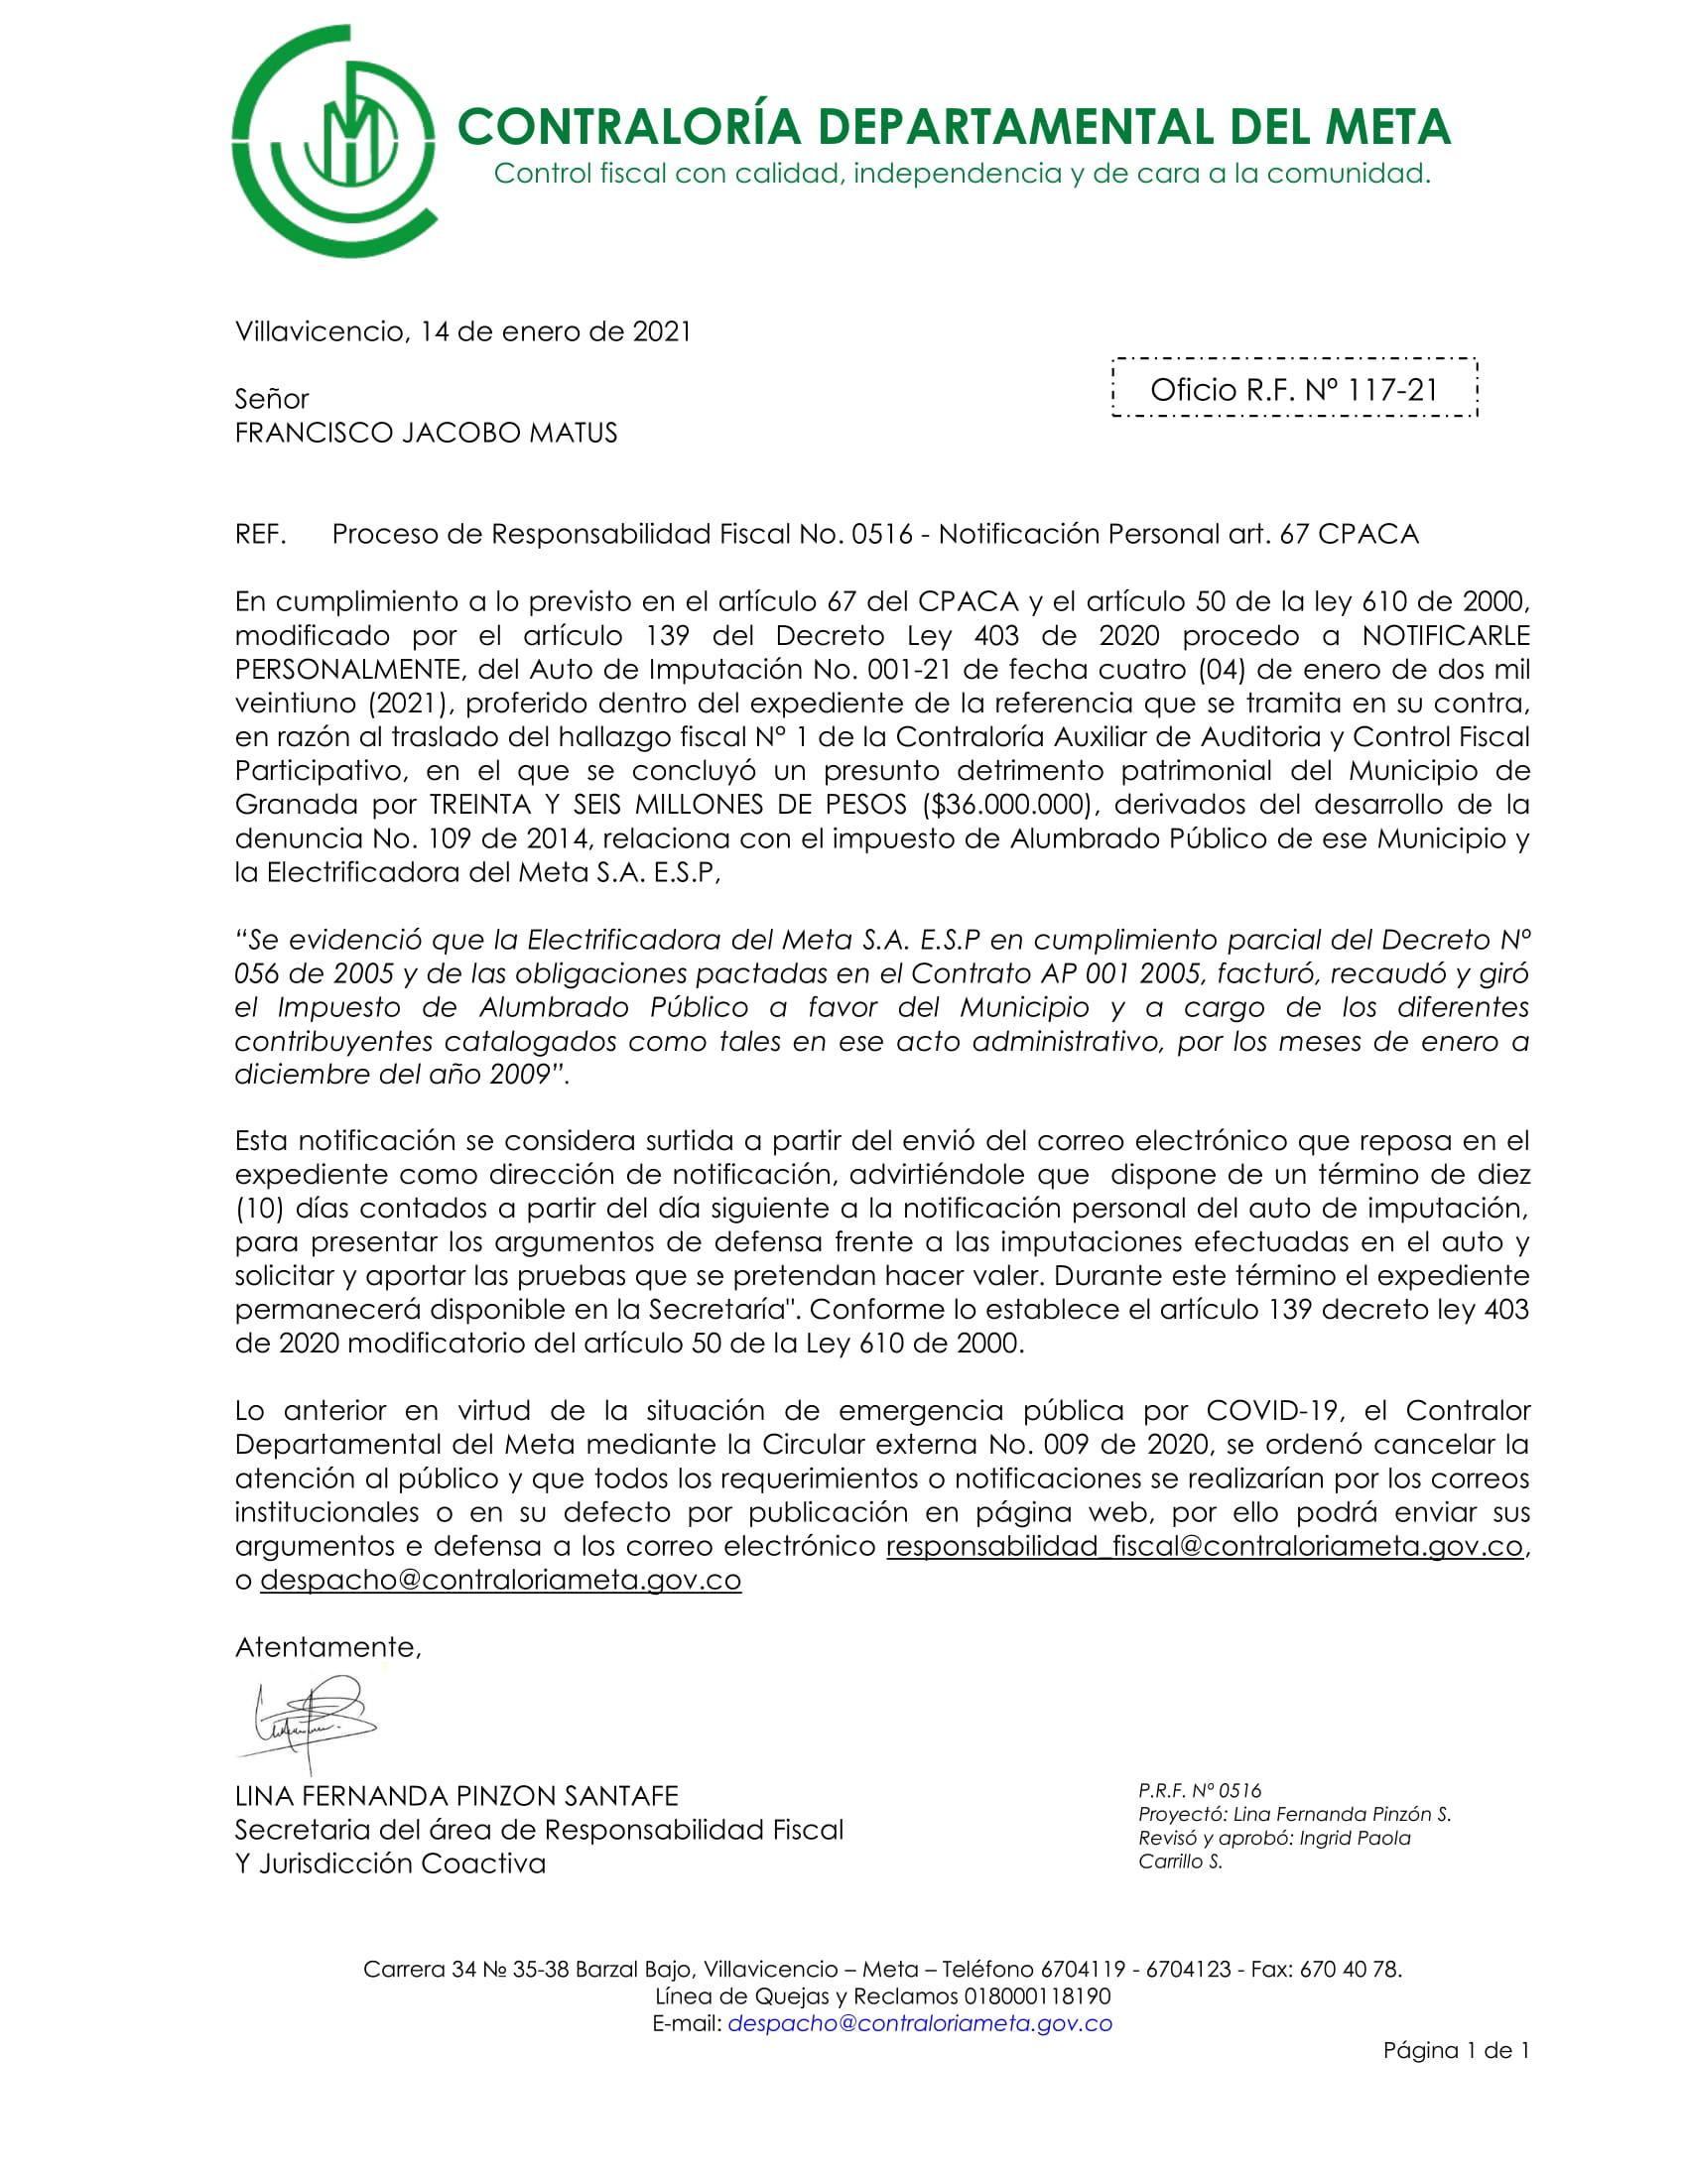 notifiacion-auto-de-imputacion-francisco-matus-prf-0516-1